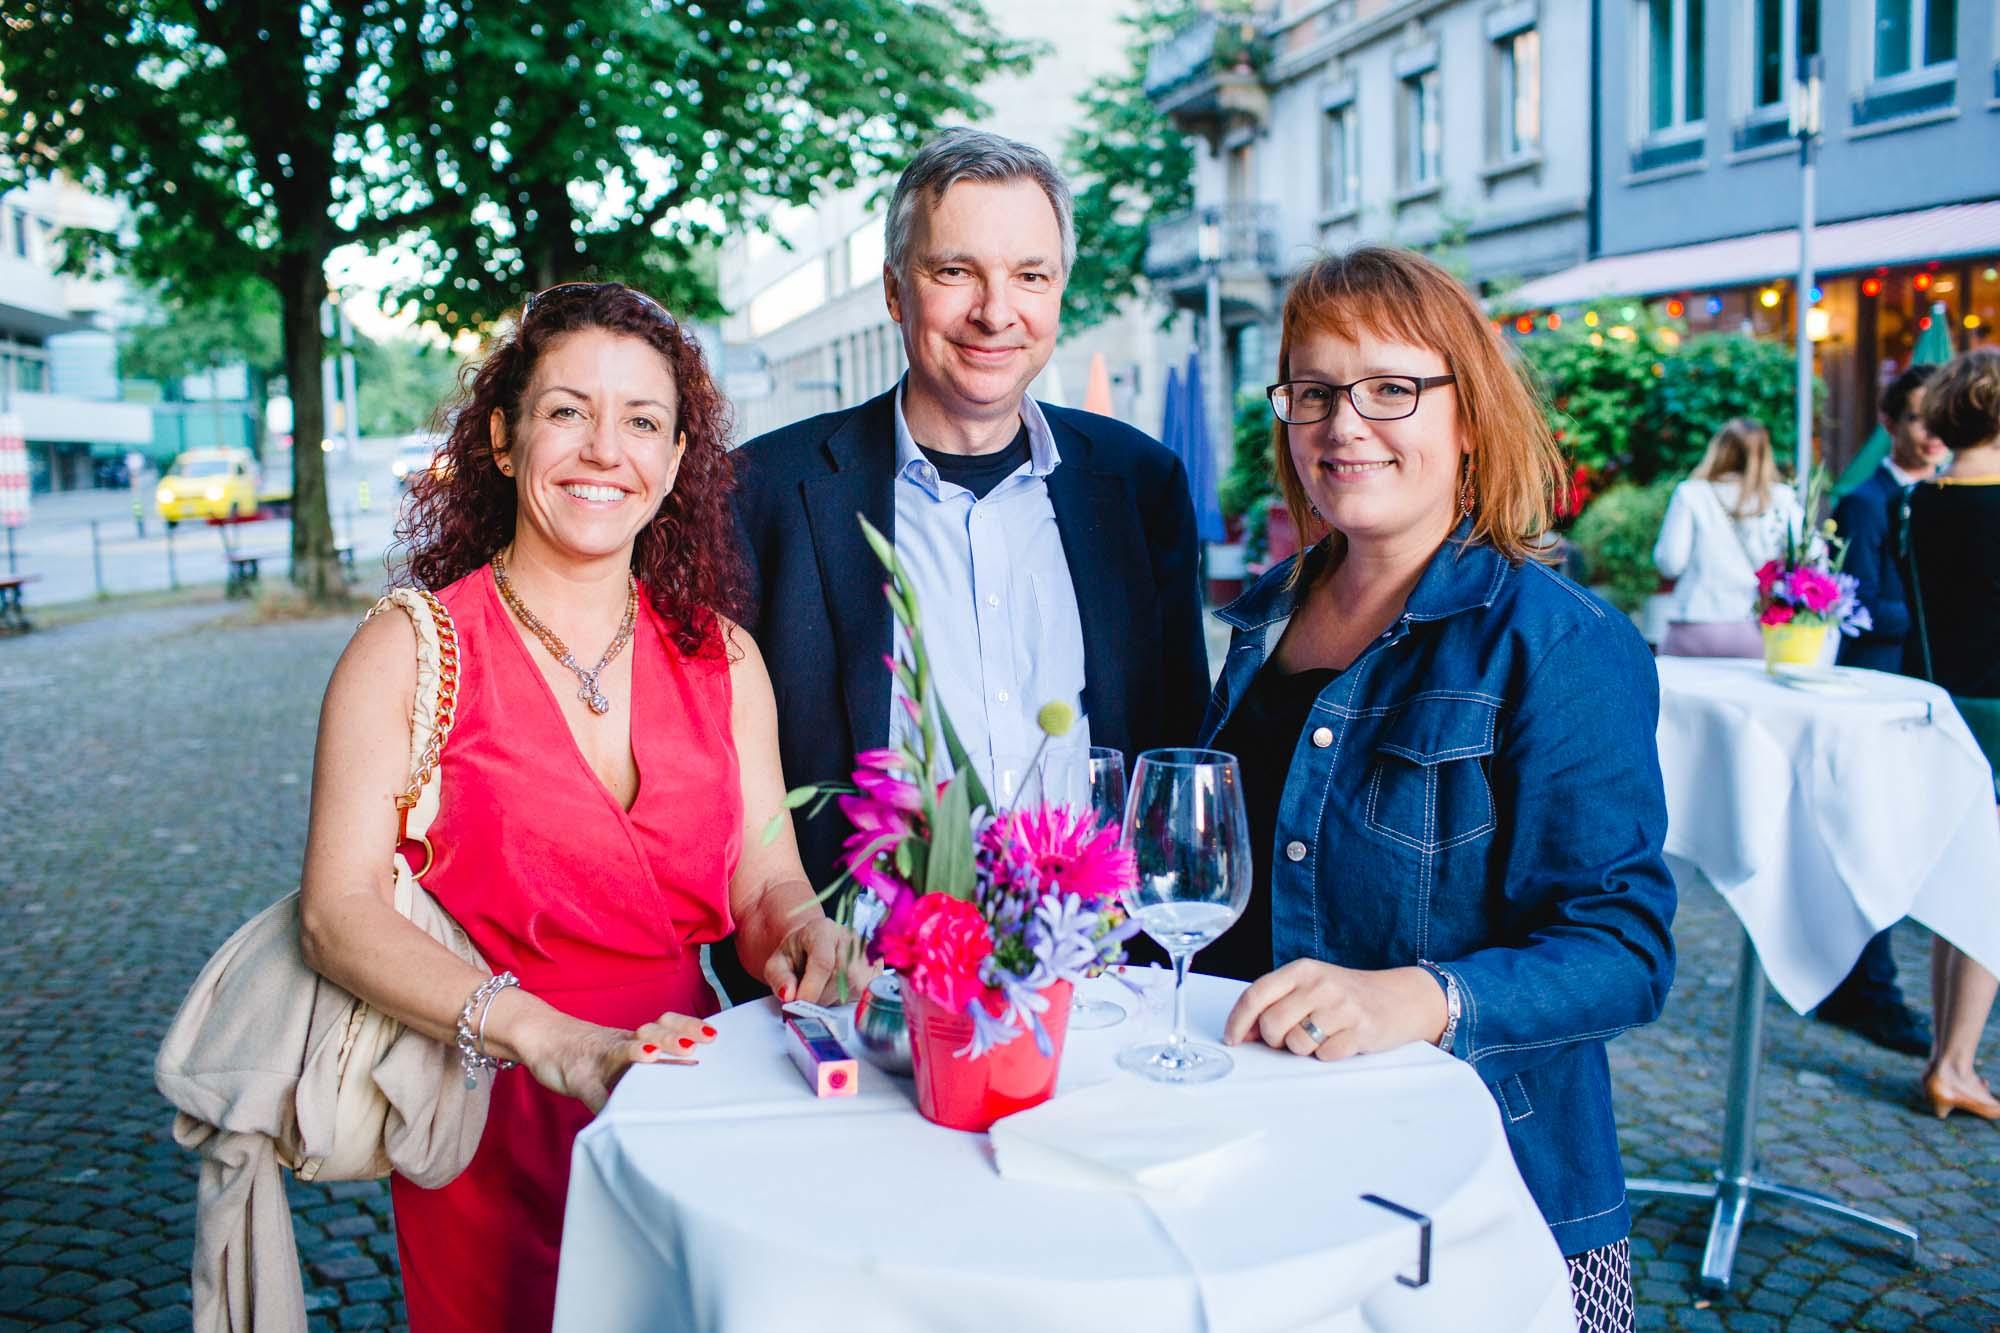 Angela Grandjean, Rolf Hartmann and Gisela Milesi